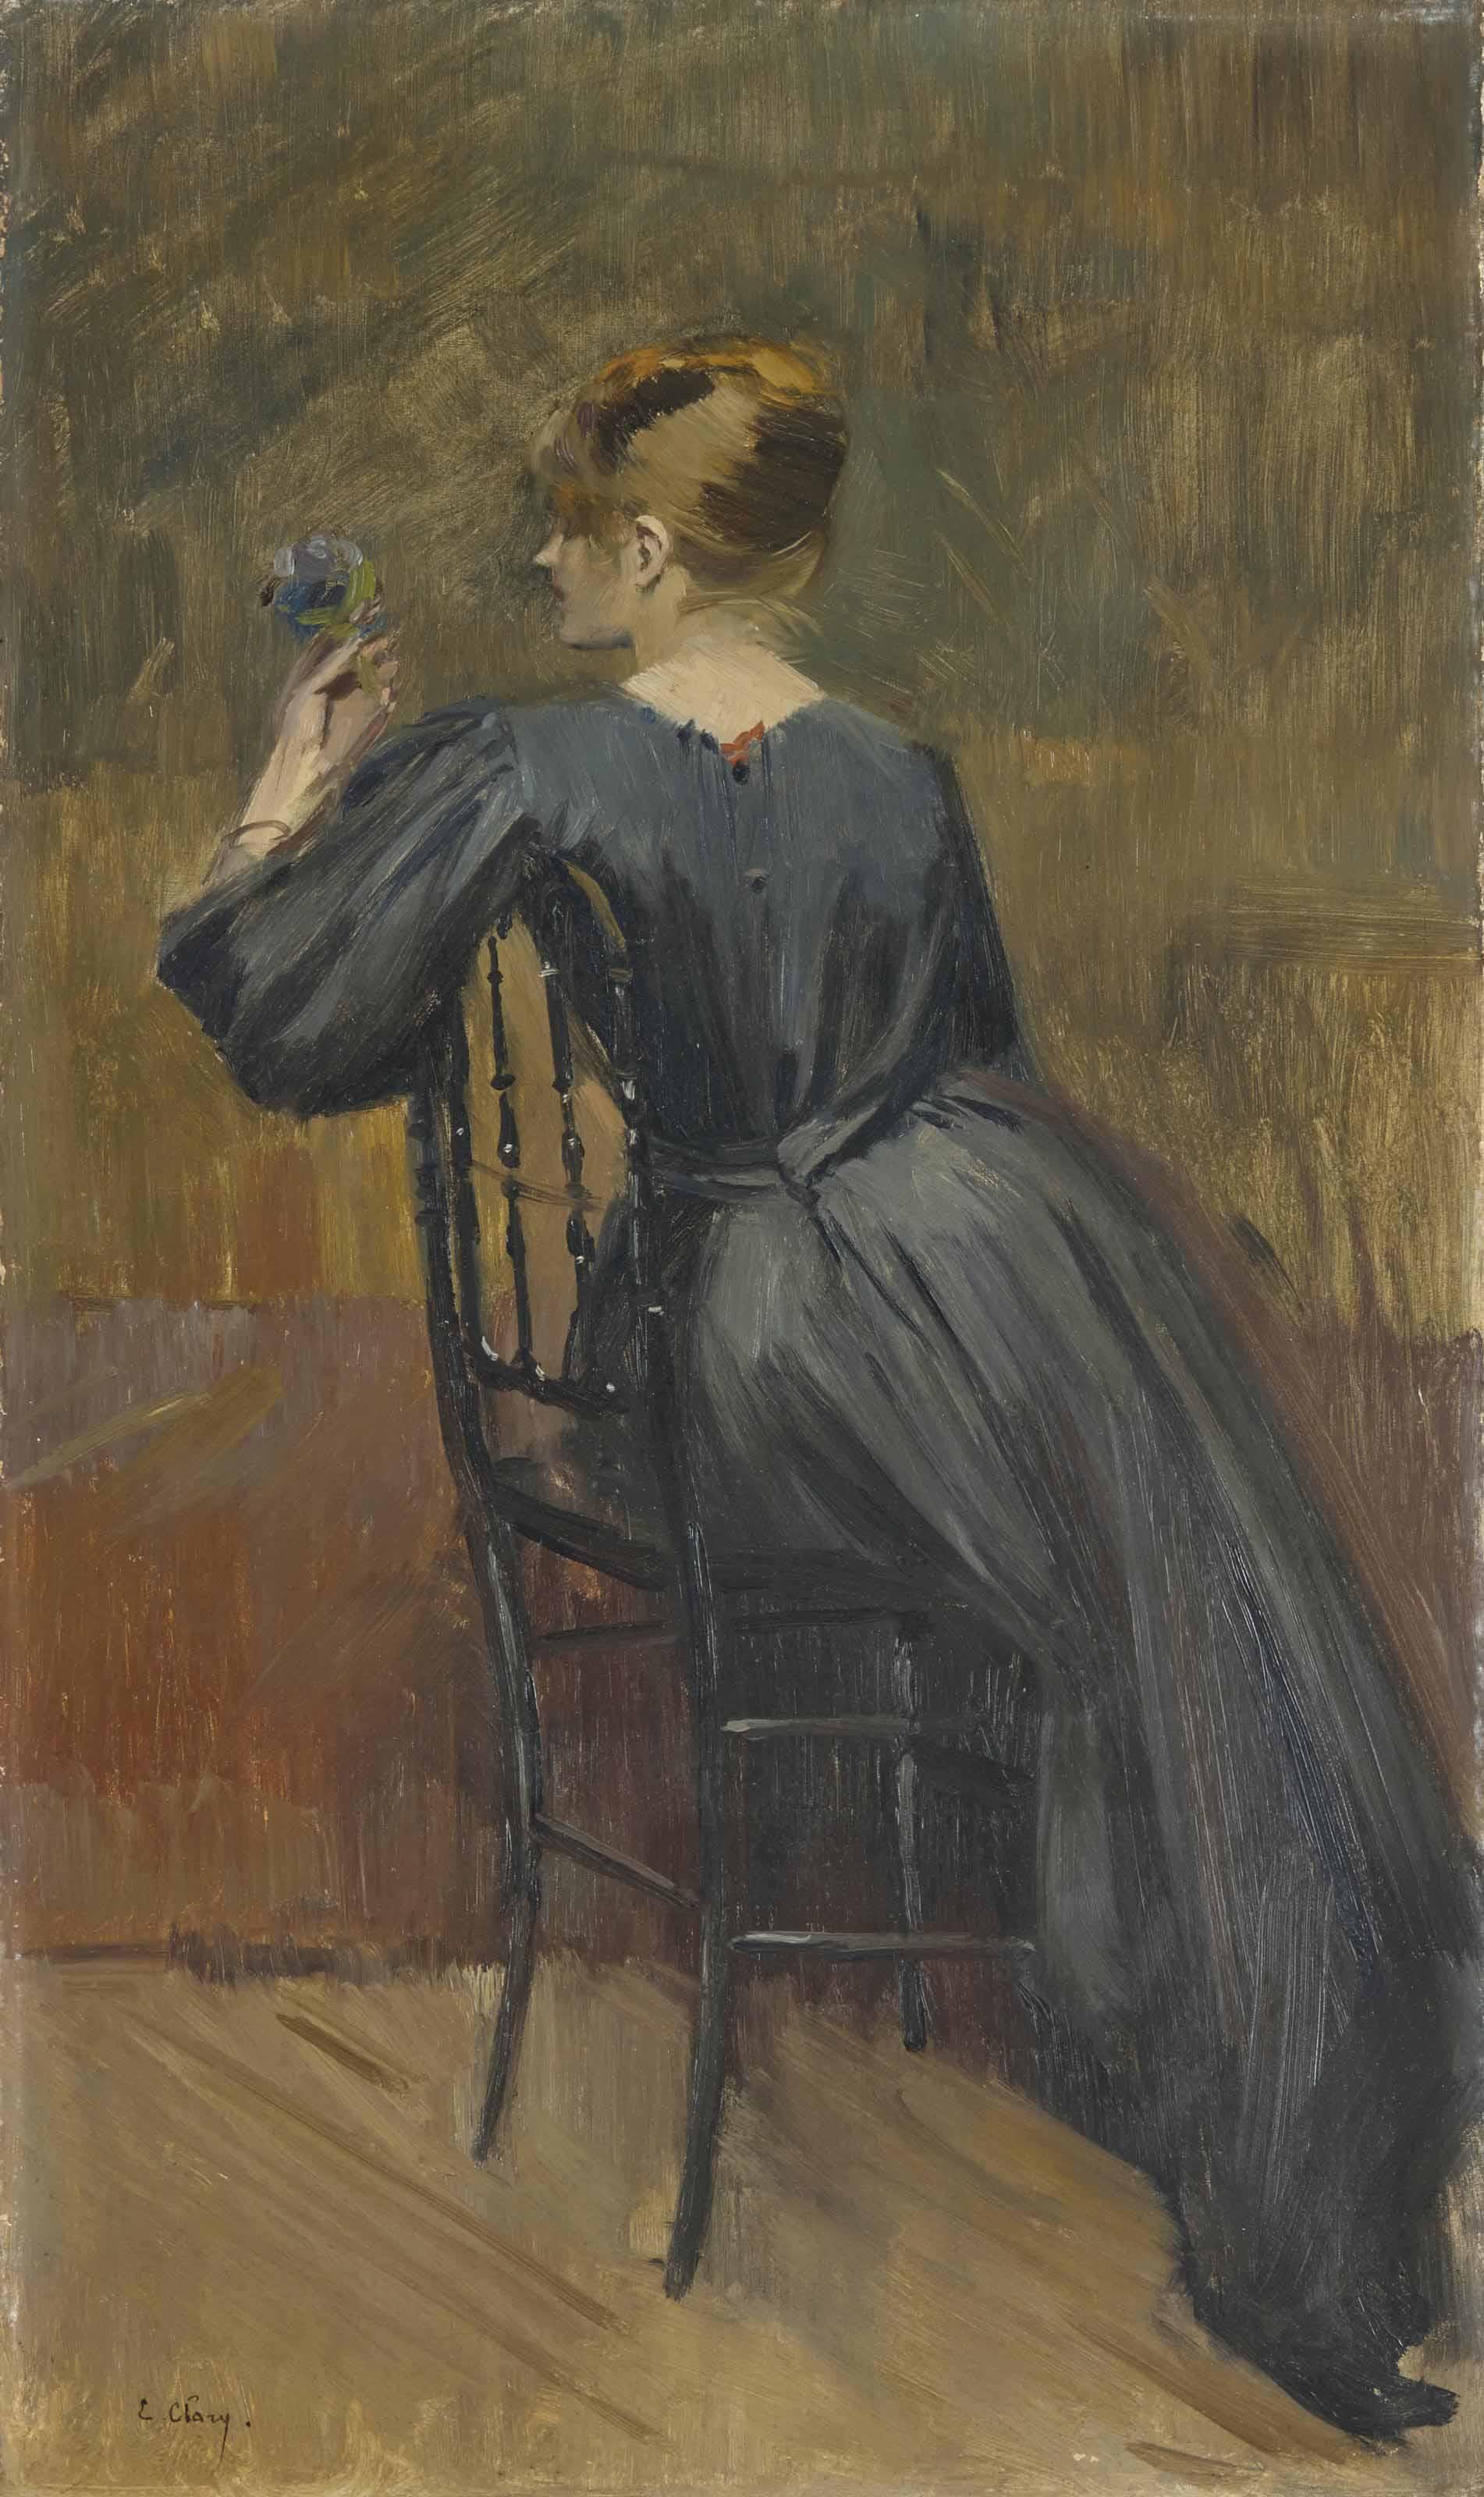 Portrait of Suzanne Valadon (1865-1938), aged 20